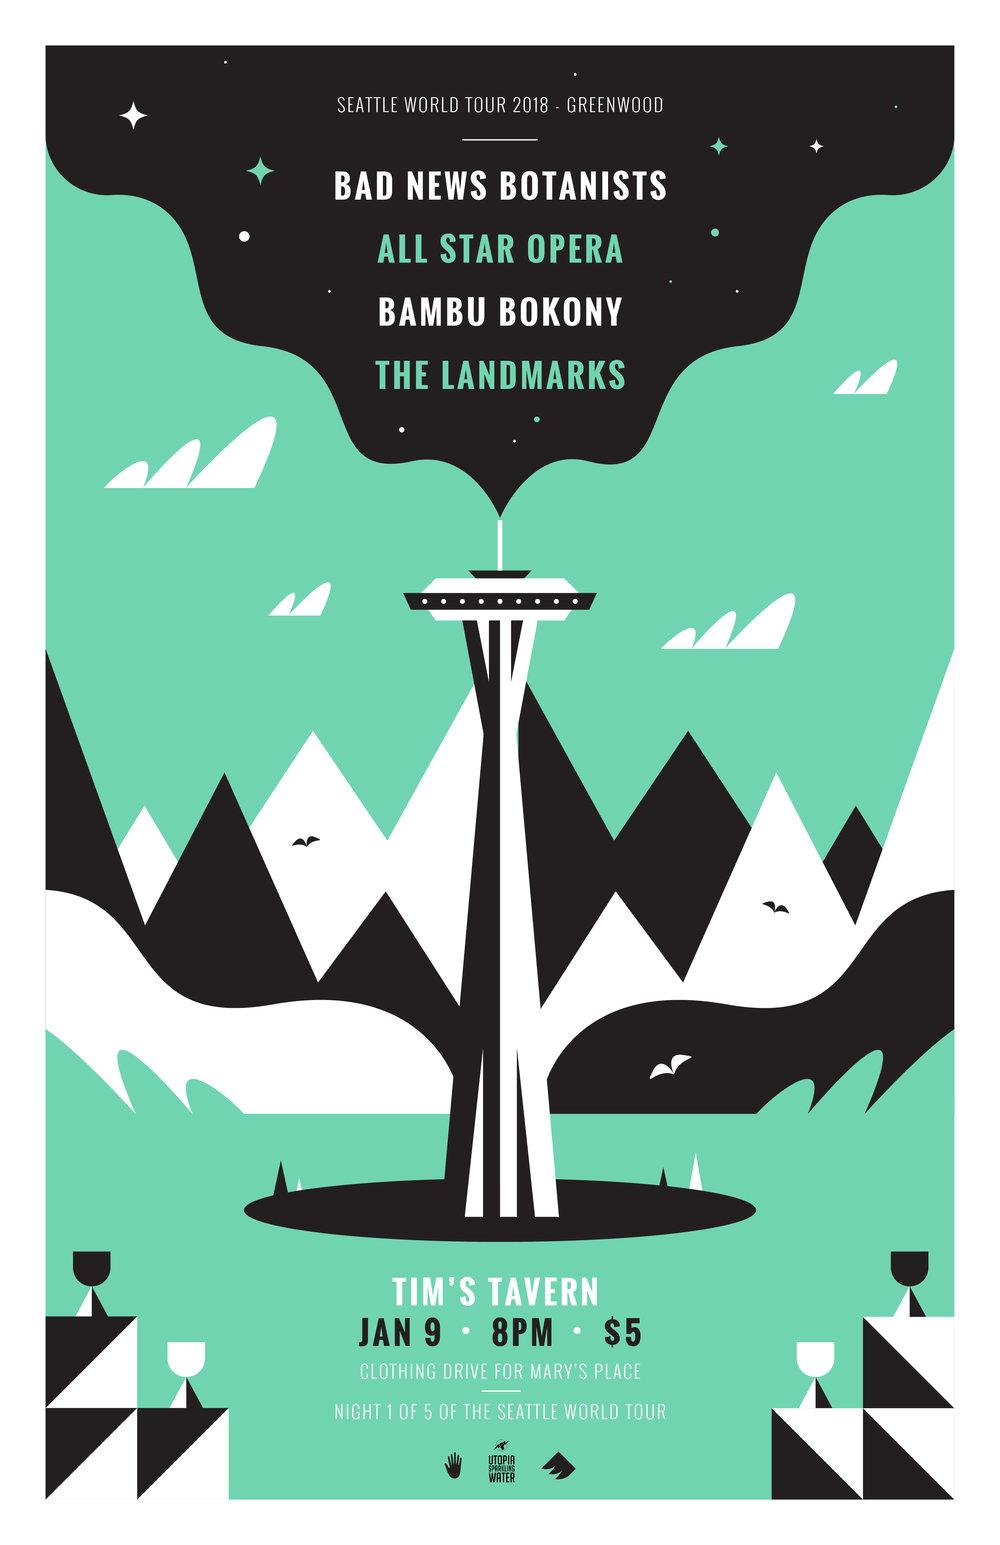 Seattle World Tour_Greenwood_Final.jpg